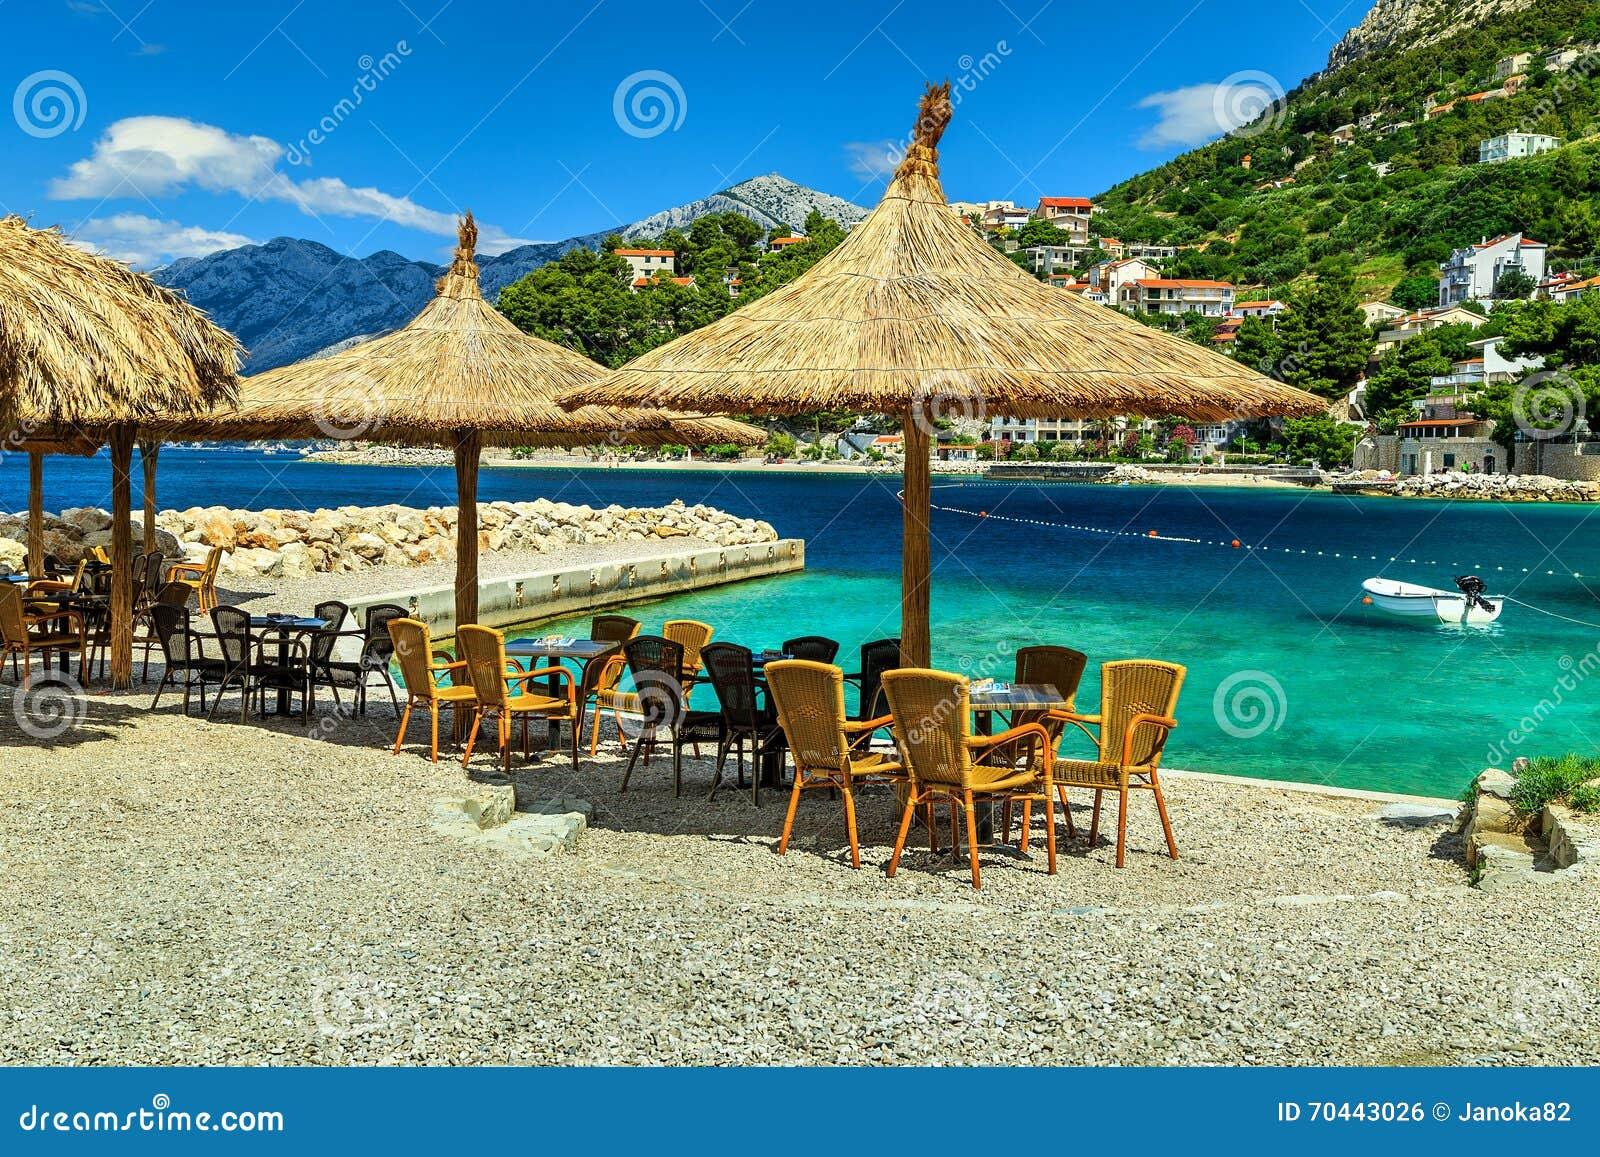 Stunning Outdoor Tropical Beach Bar Brela Dalmatia Croatia